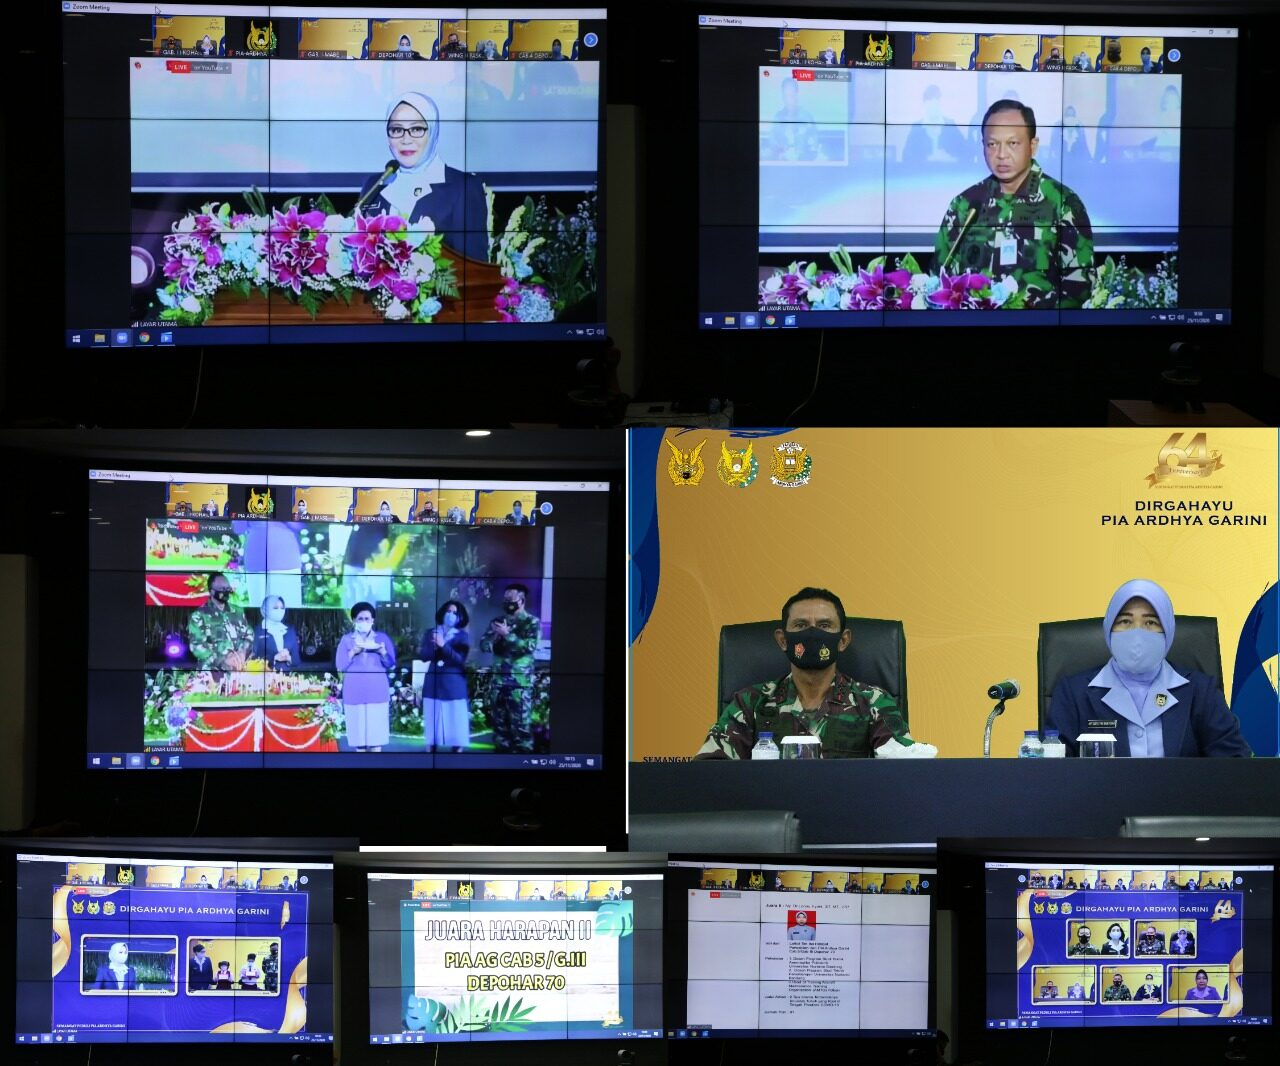 HUT PIA Ardhya Garini Ke-64 Dirayakan Secara Virtual